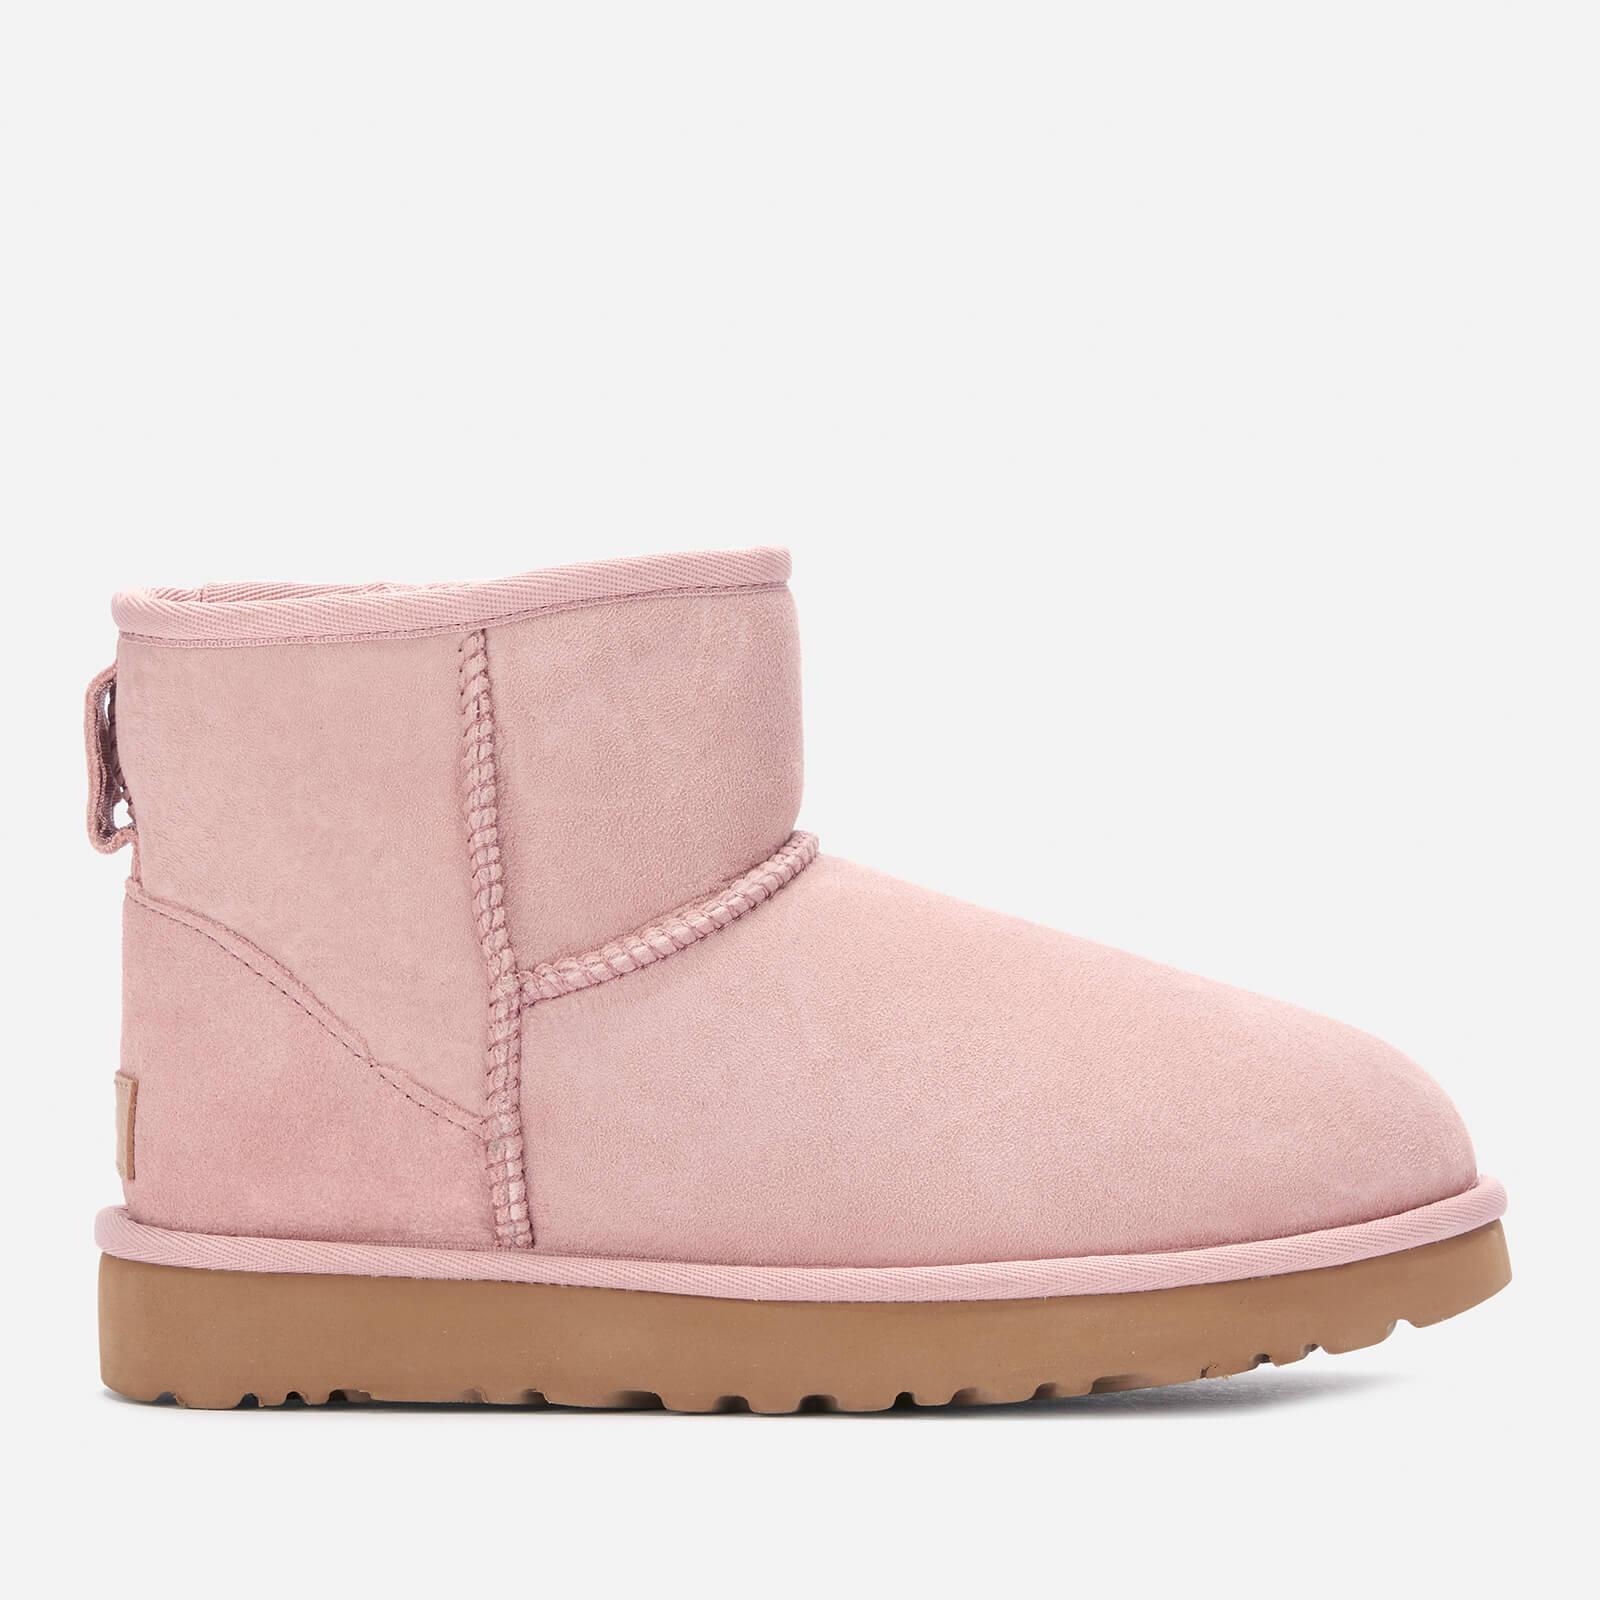 UGG Women's Classic Mini II Sheepskin Boots - Pink Crystal - UK 3